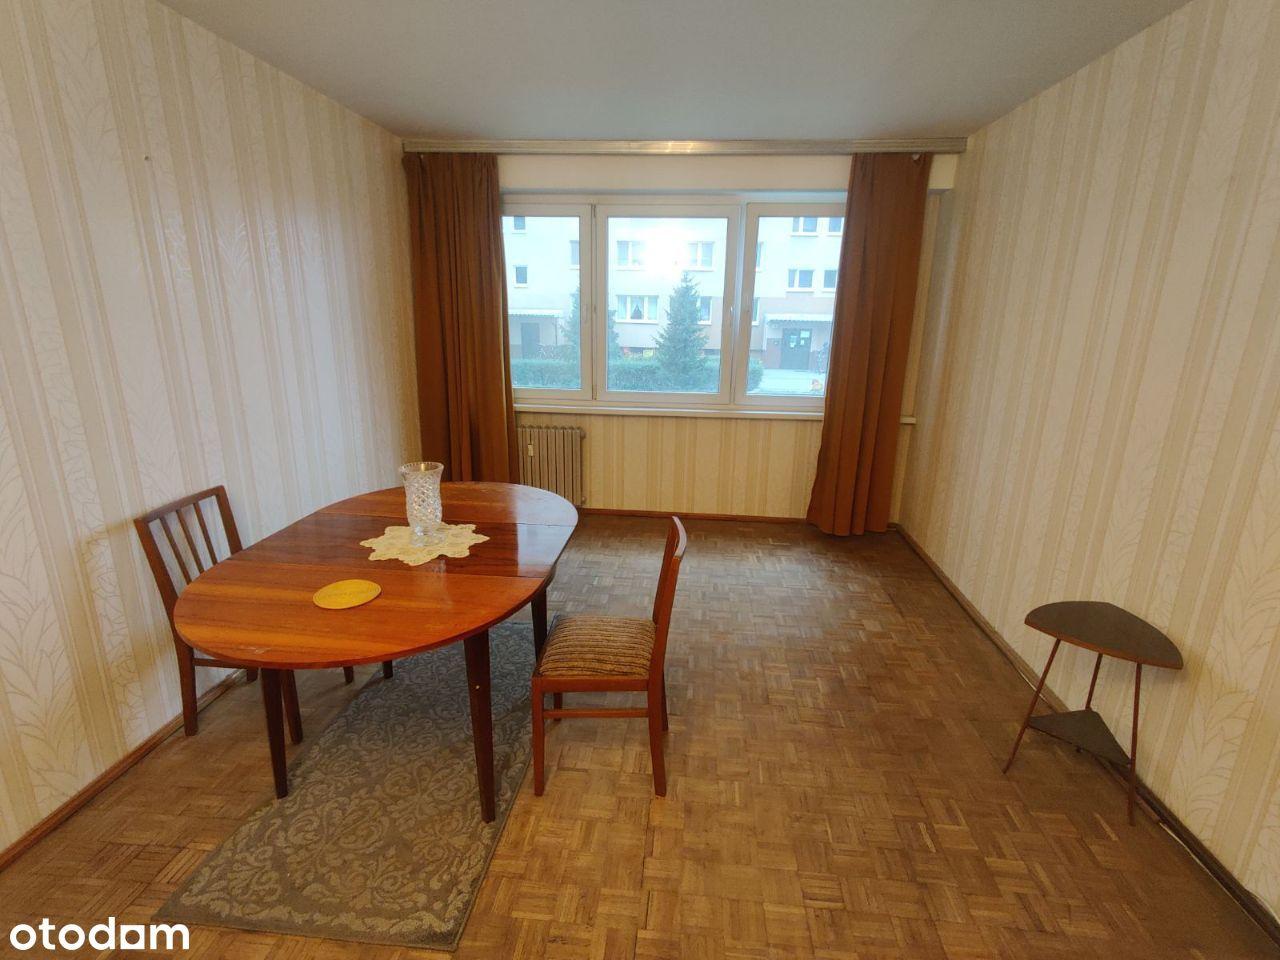 2 pokoje w centrum, parter